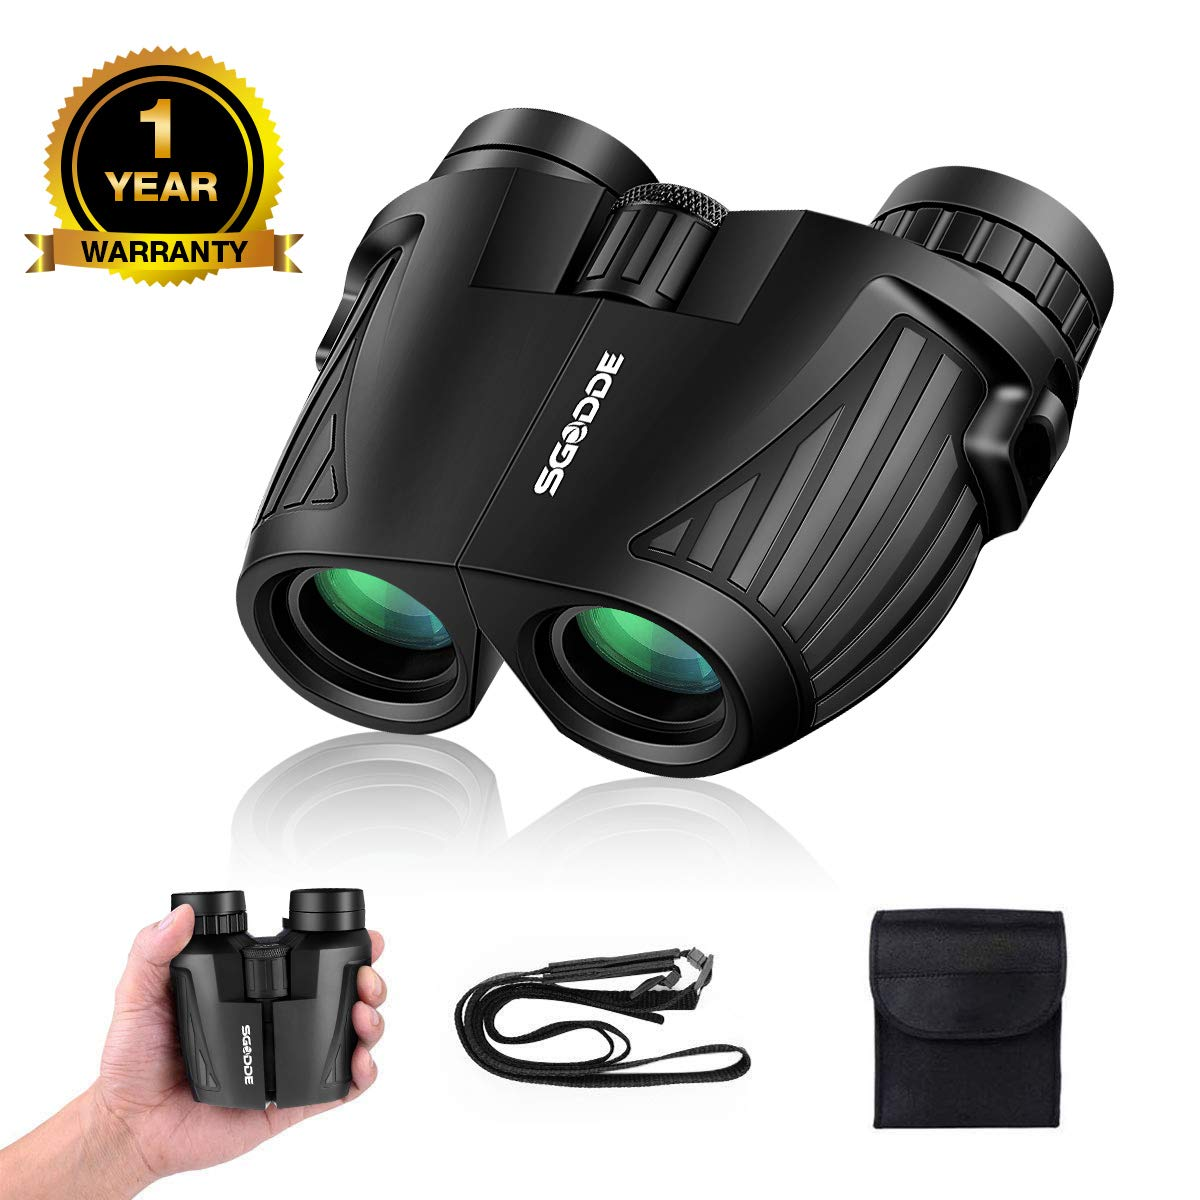 12x25 Compact Binoculars SGODDE Binoculars for Adults with Low Light Night Vision, Folding High Power Waterproof Binocular Easy Focus for Outdoor Hunting, Bird Watching,Traveling, Concert, Sport Games by SGODDE